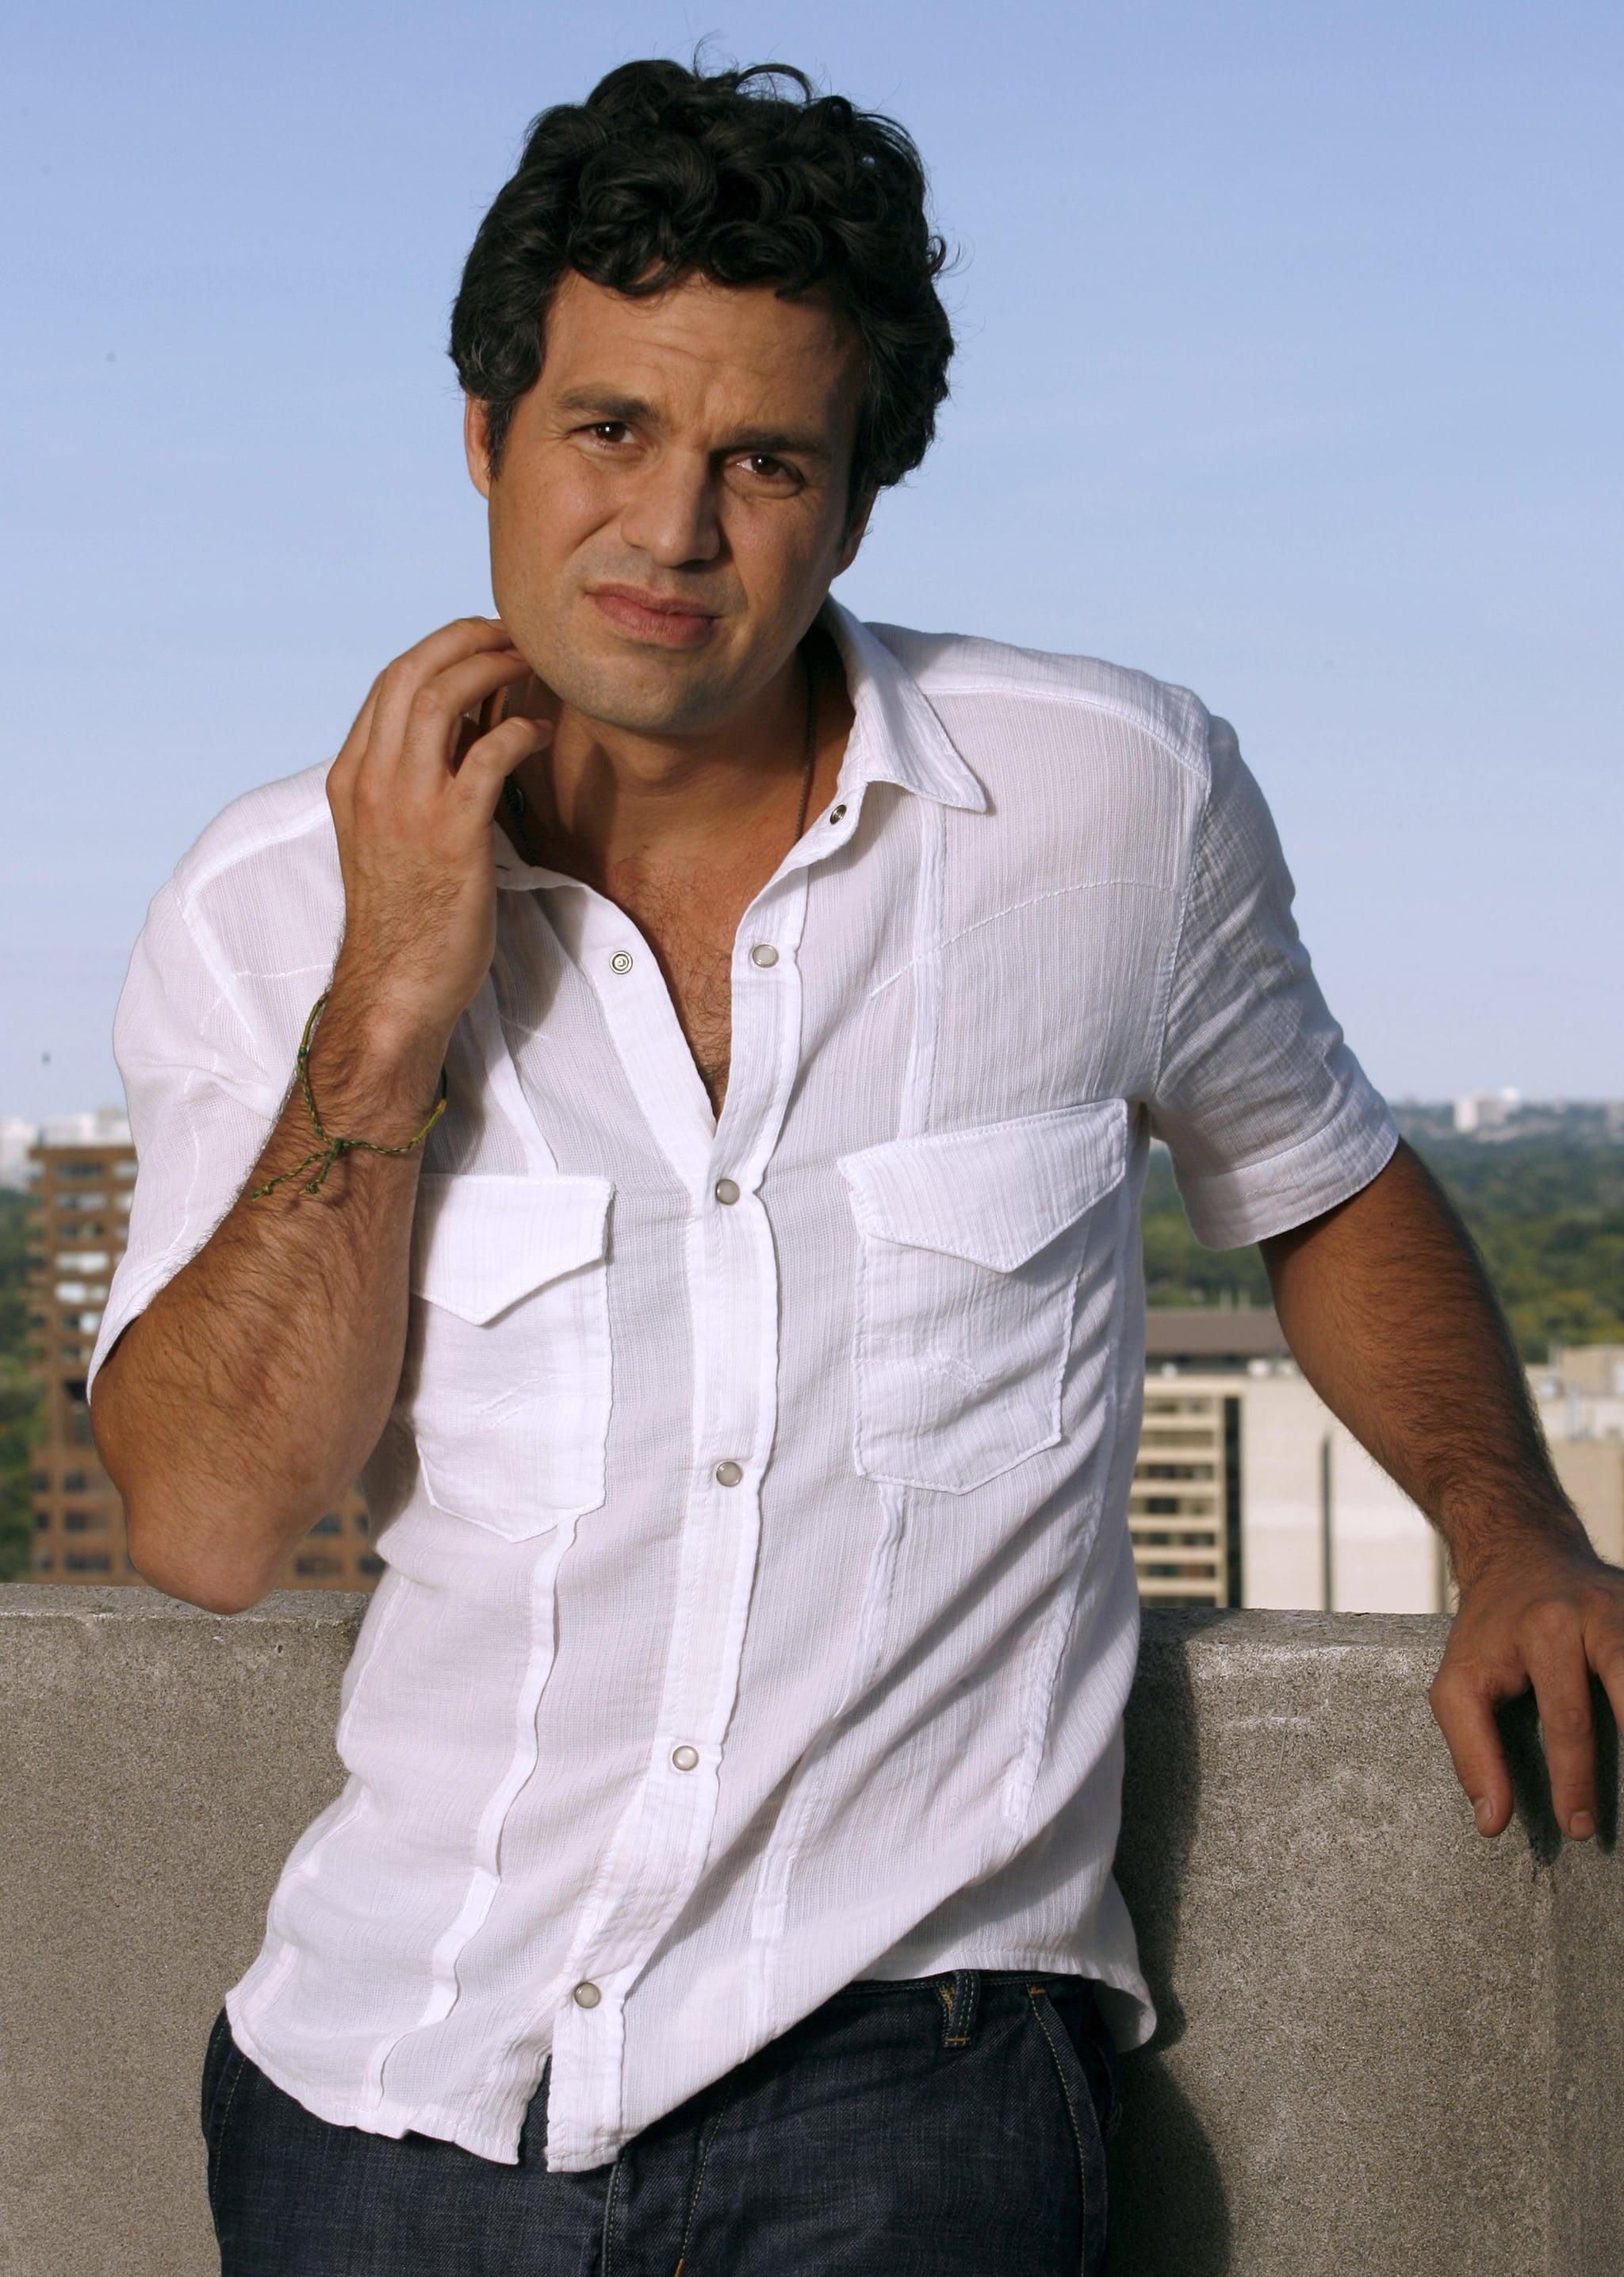 Sexy Mark Ruffalo Pictures Popsugar Celebrity Uk